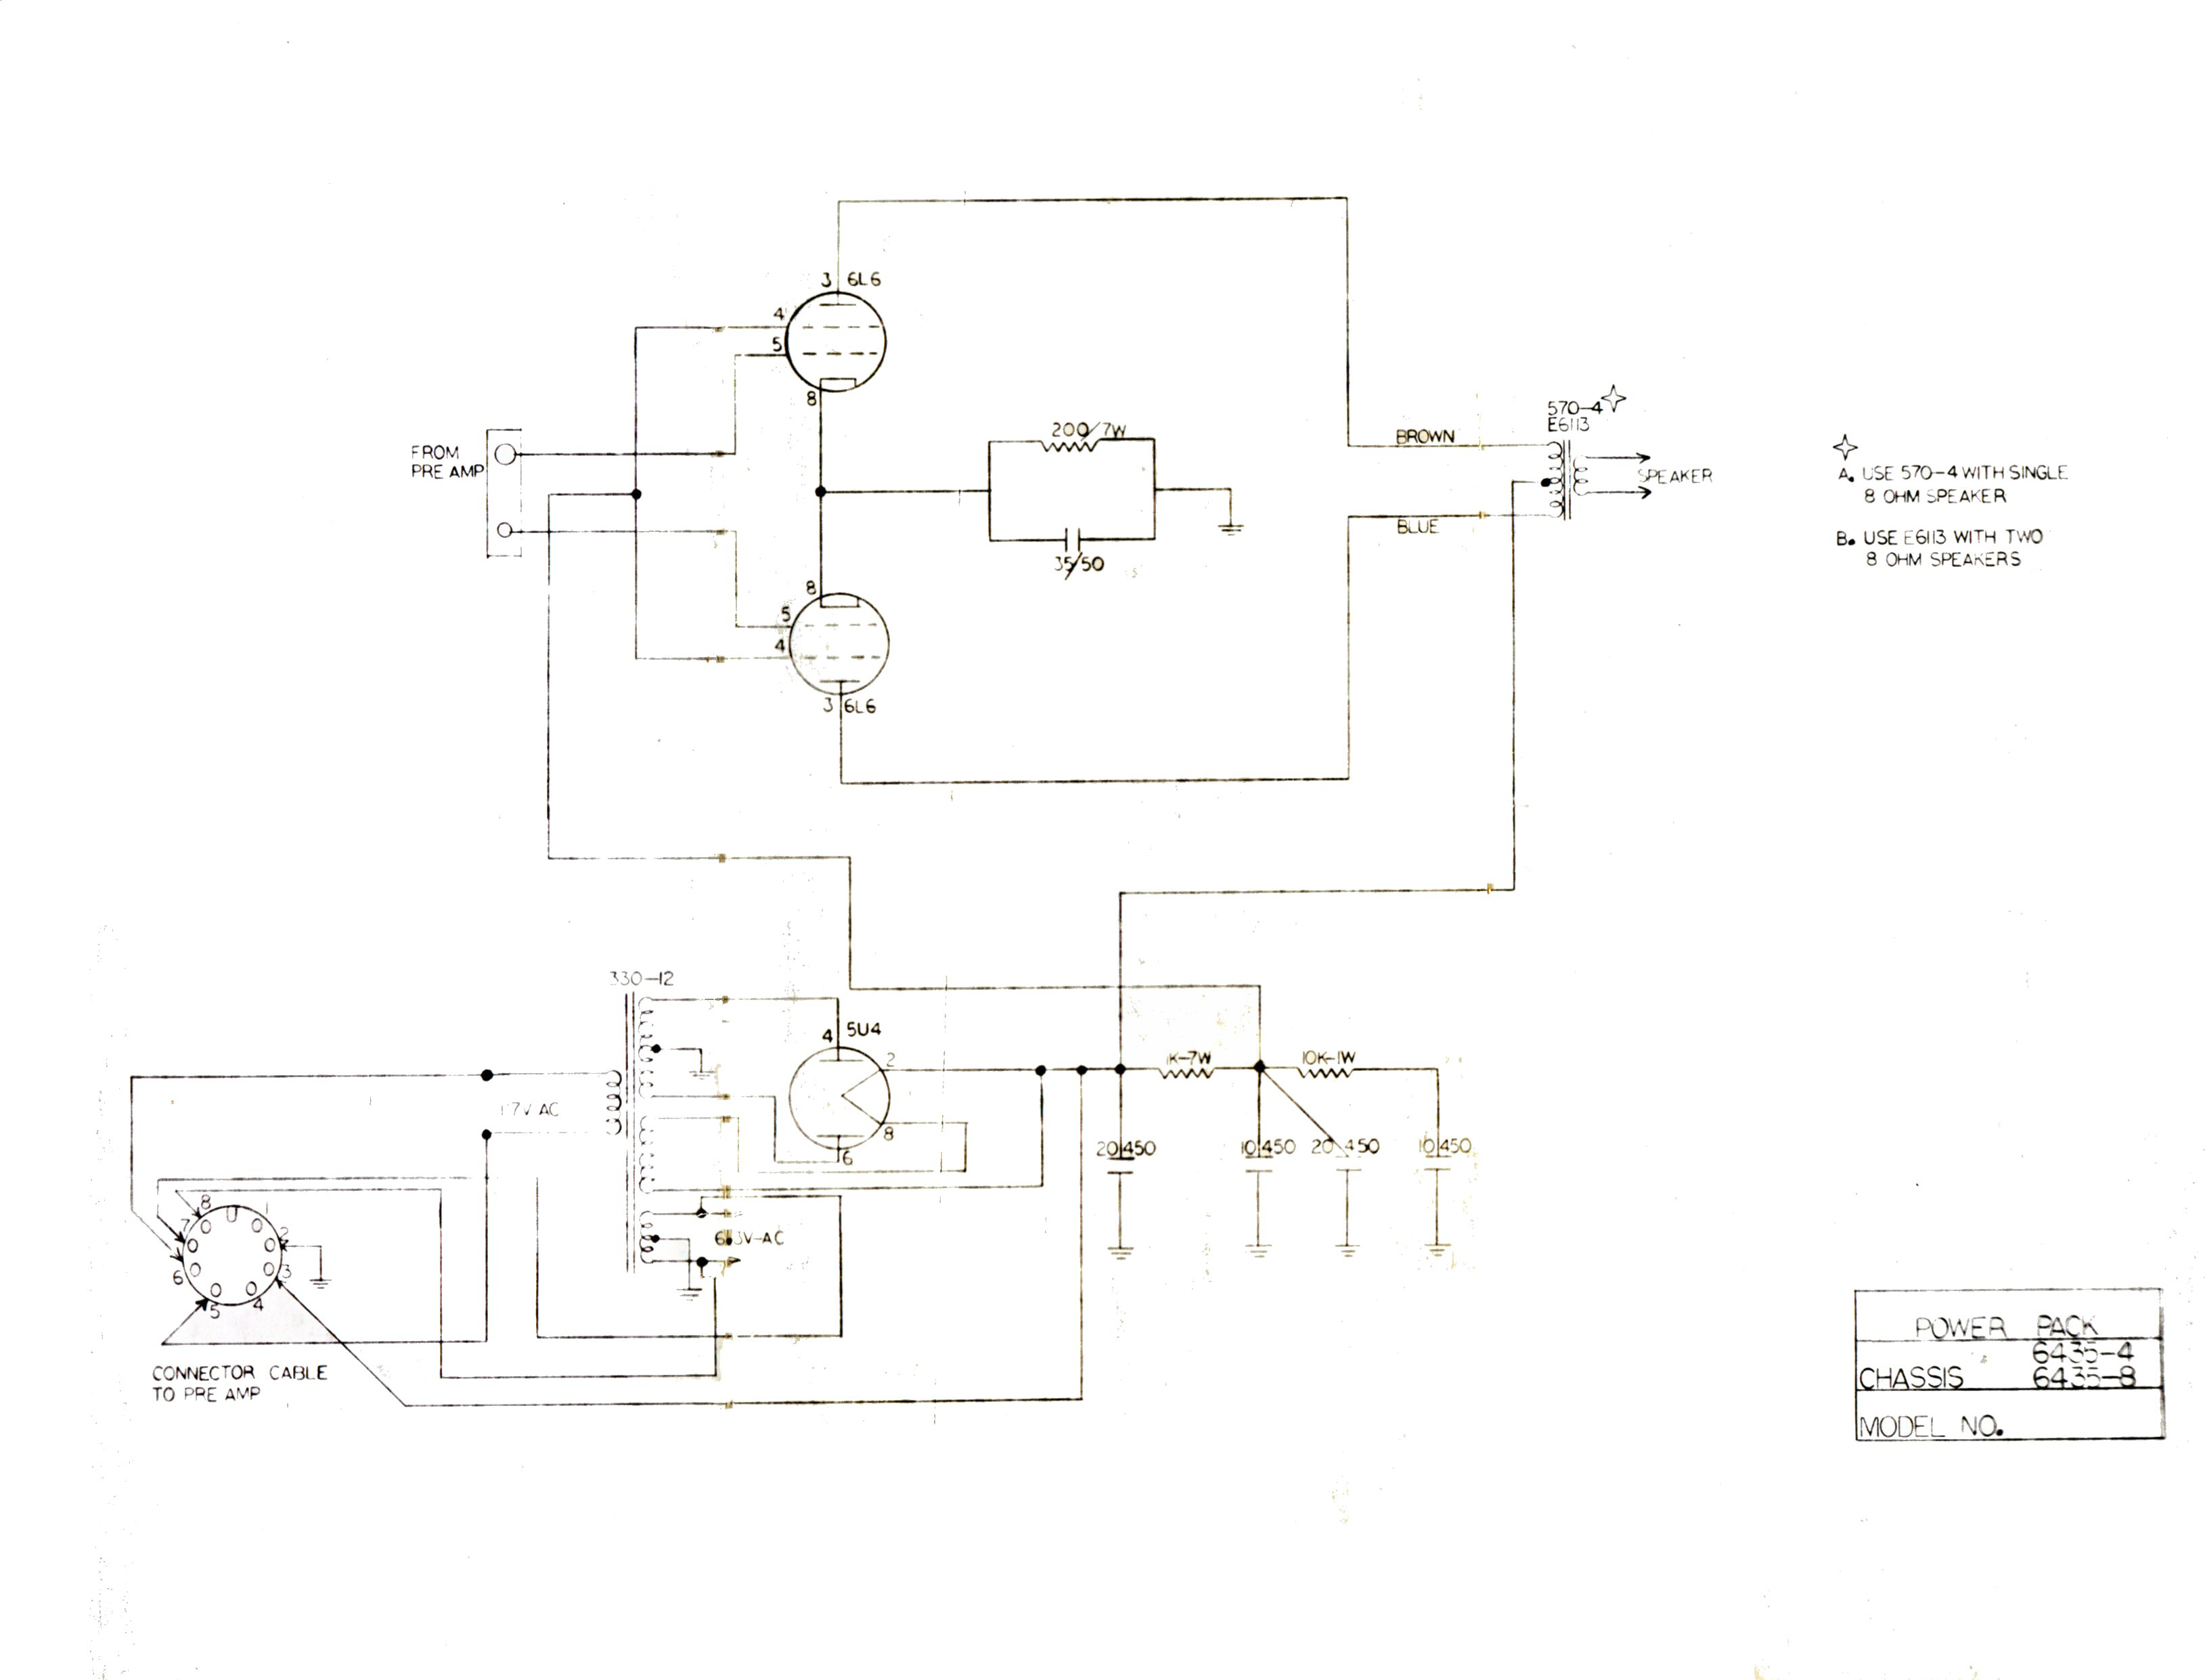 Gretsch Amp Schematic   Wiring Diagram Technic on johnson wiring diagram, gibson wiring diagram, stratocaster wiring diagram, hagstrom wiring diagram, hamer wiring diagram, manufacturing wiring diagram, fishman wiring diagram, jackson wiring diagram, duncan performer wiring diagram, michael kelly wiring diagram, gator wiring diagram, harmony wiring diagram, silvertone wiring diagram, dean ml wiring diagram, dimarzio wiring diagram, korg wiring diagram, mosrite wiring diagram, musicman wiring diagram, taylor wiring diagram, kurzweil wiring diagram,